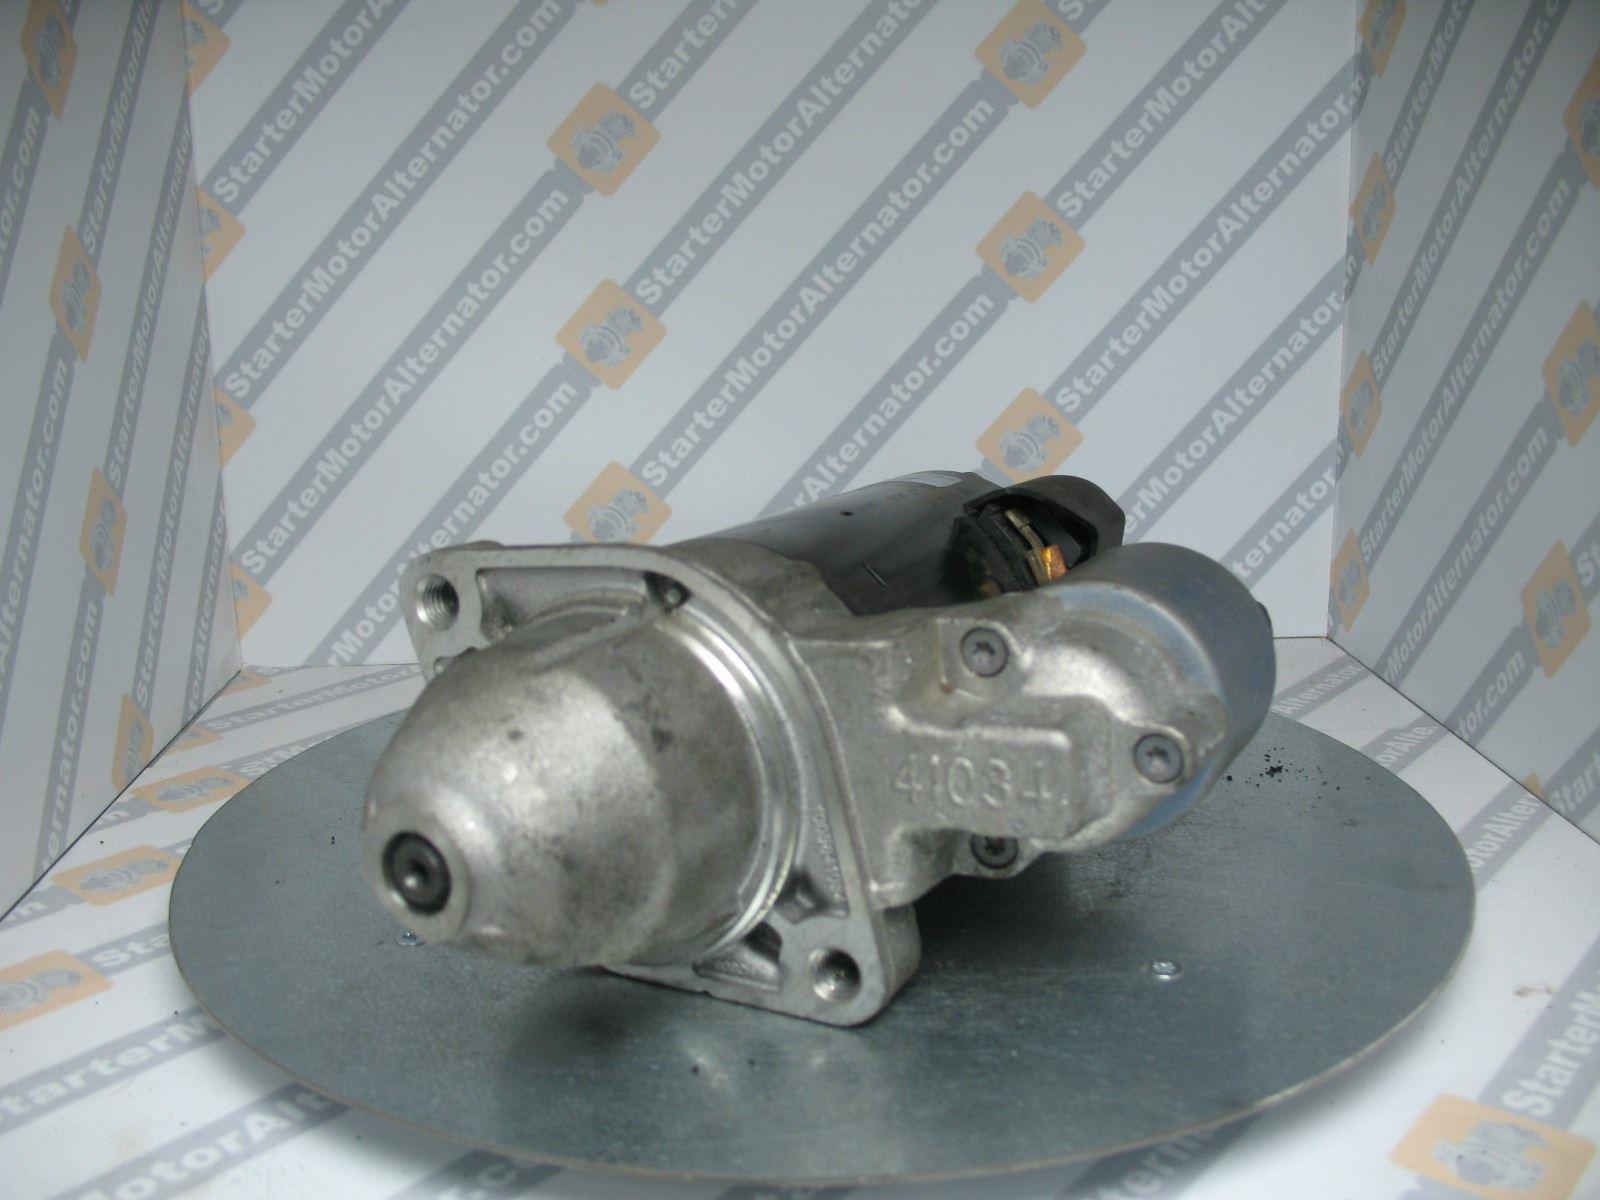 XIY2602 Starter Motor For Mercedes Benz